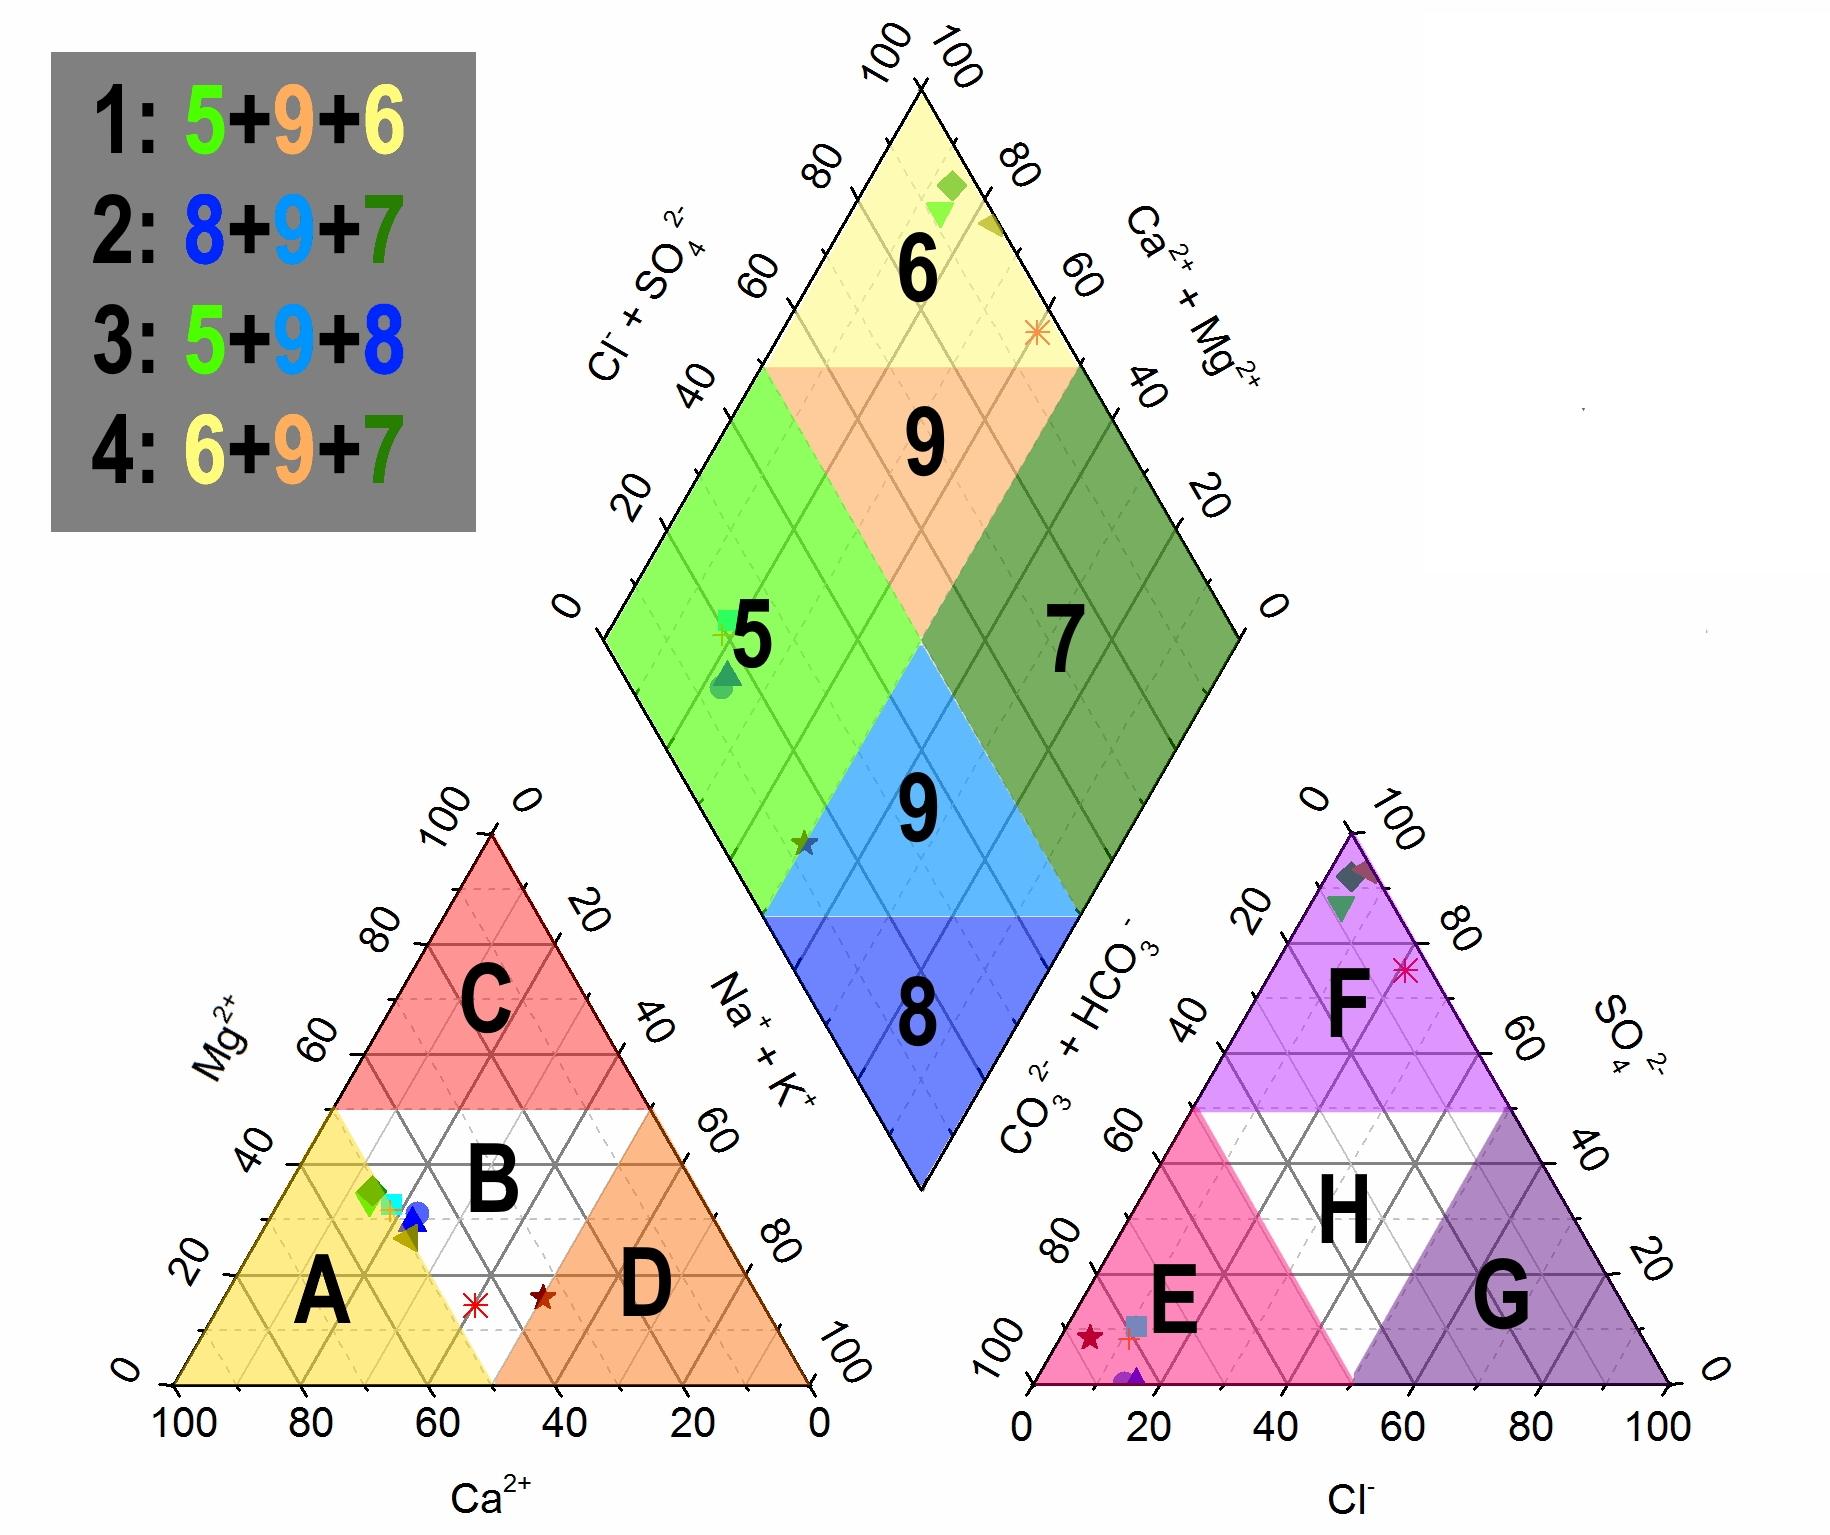 File Hydrochemical Facies In The Piper Diagram